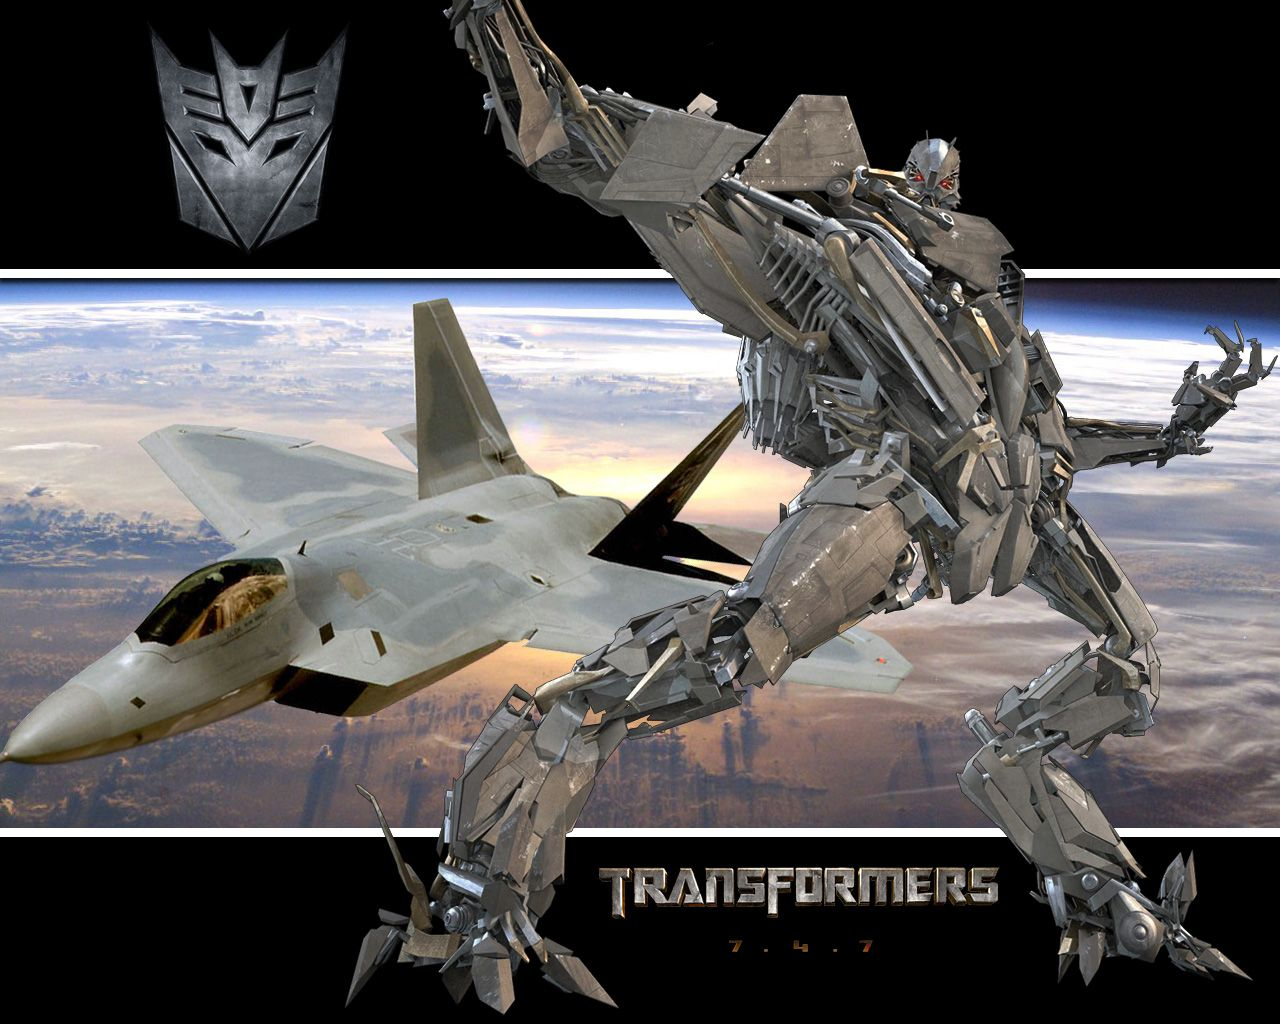 Starscream Decepticon Transformers Movie Transformers Movie Wallpapers